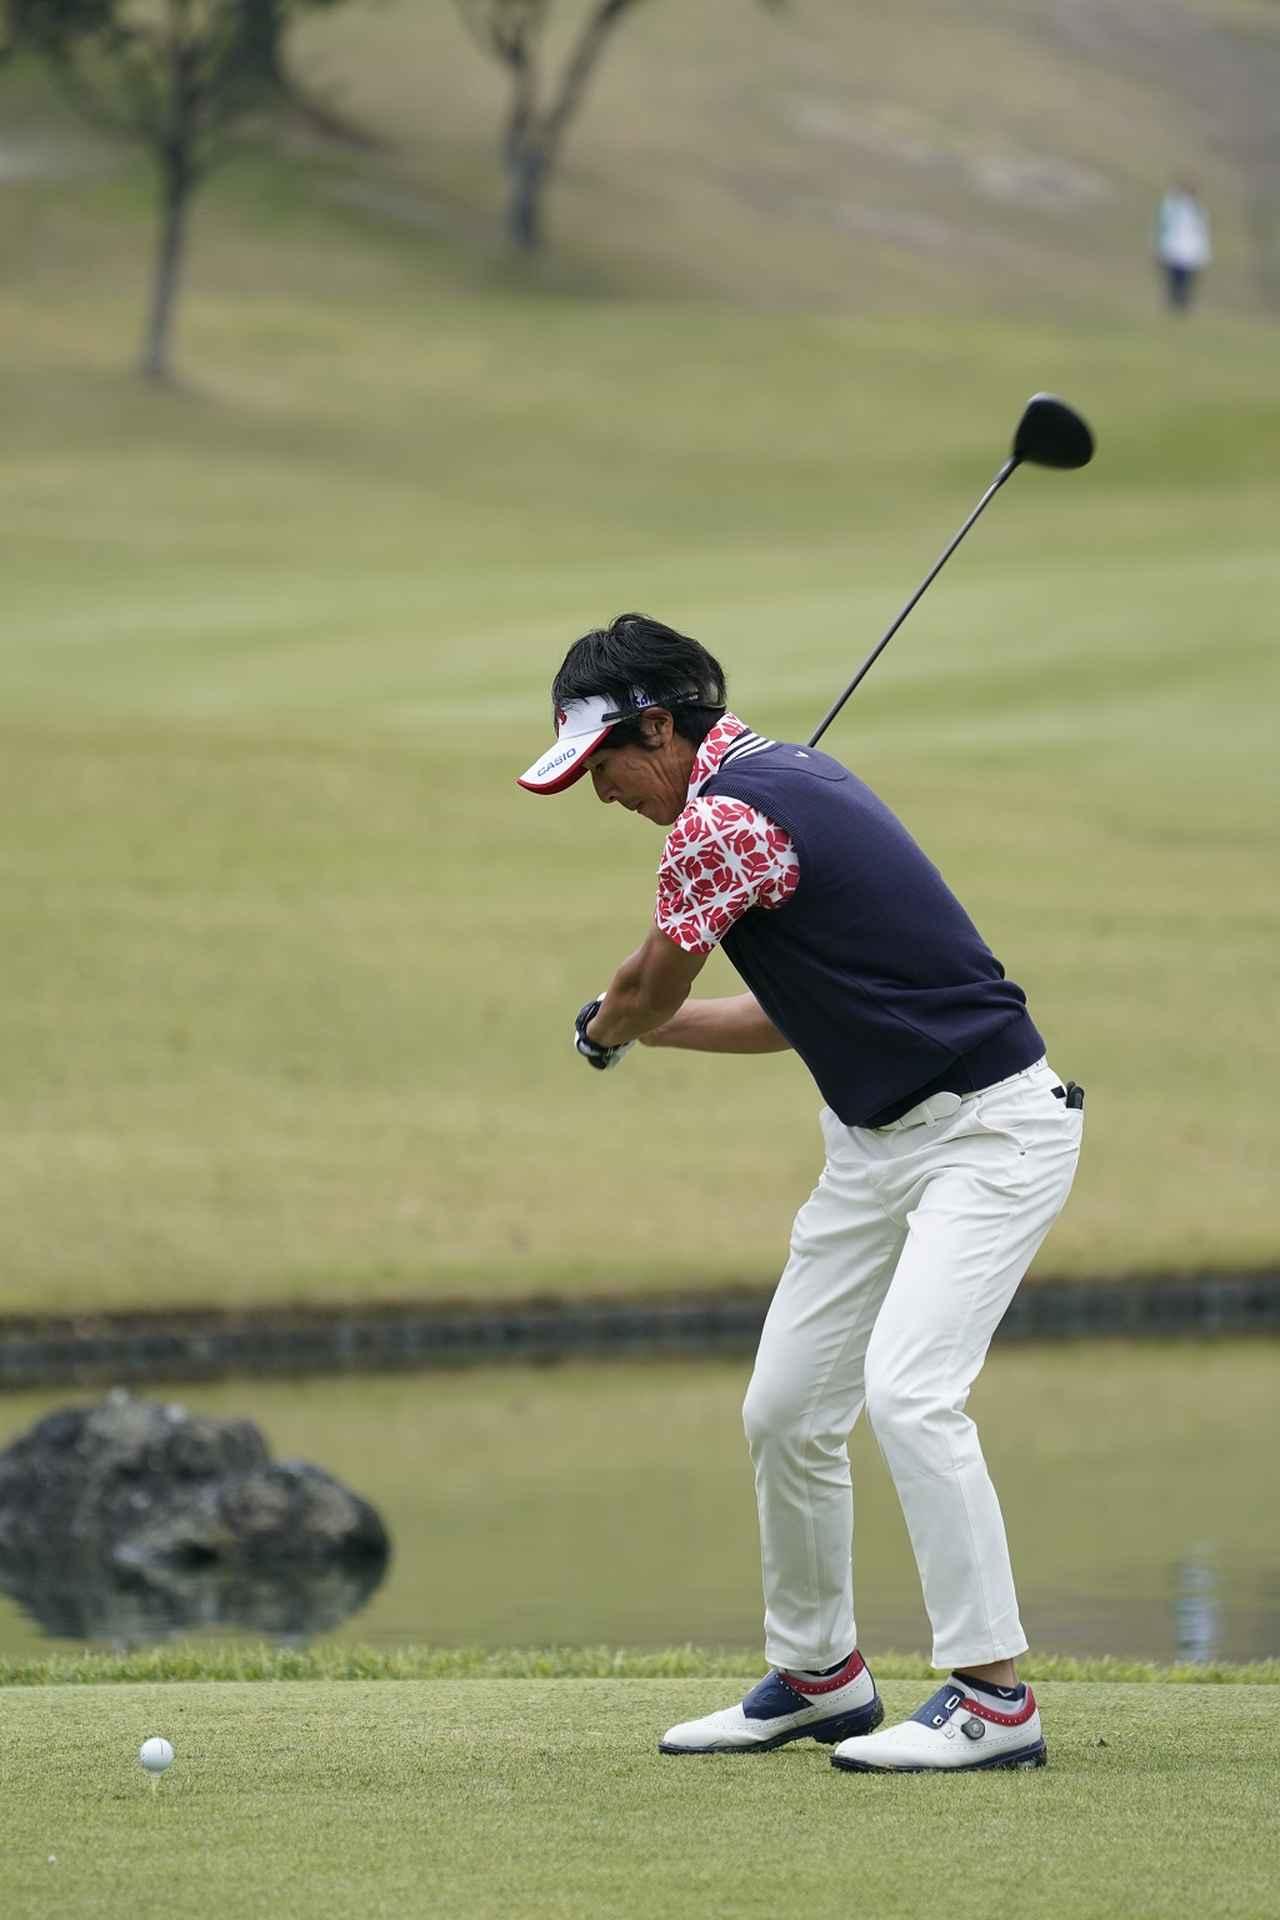 Images : 9番目の画像 - 石川遼ドライバー前方連続写真 - みんなのゴルフダイジェスト